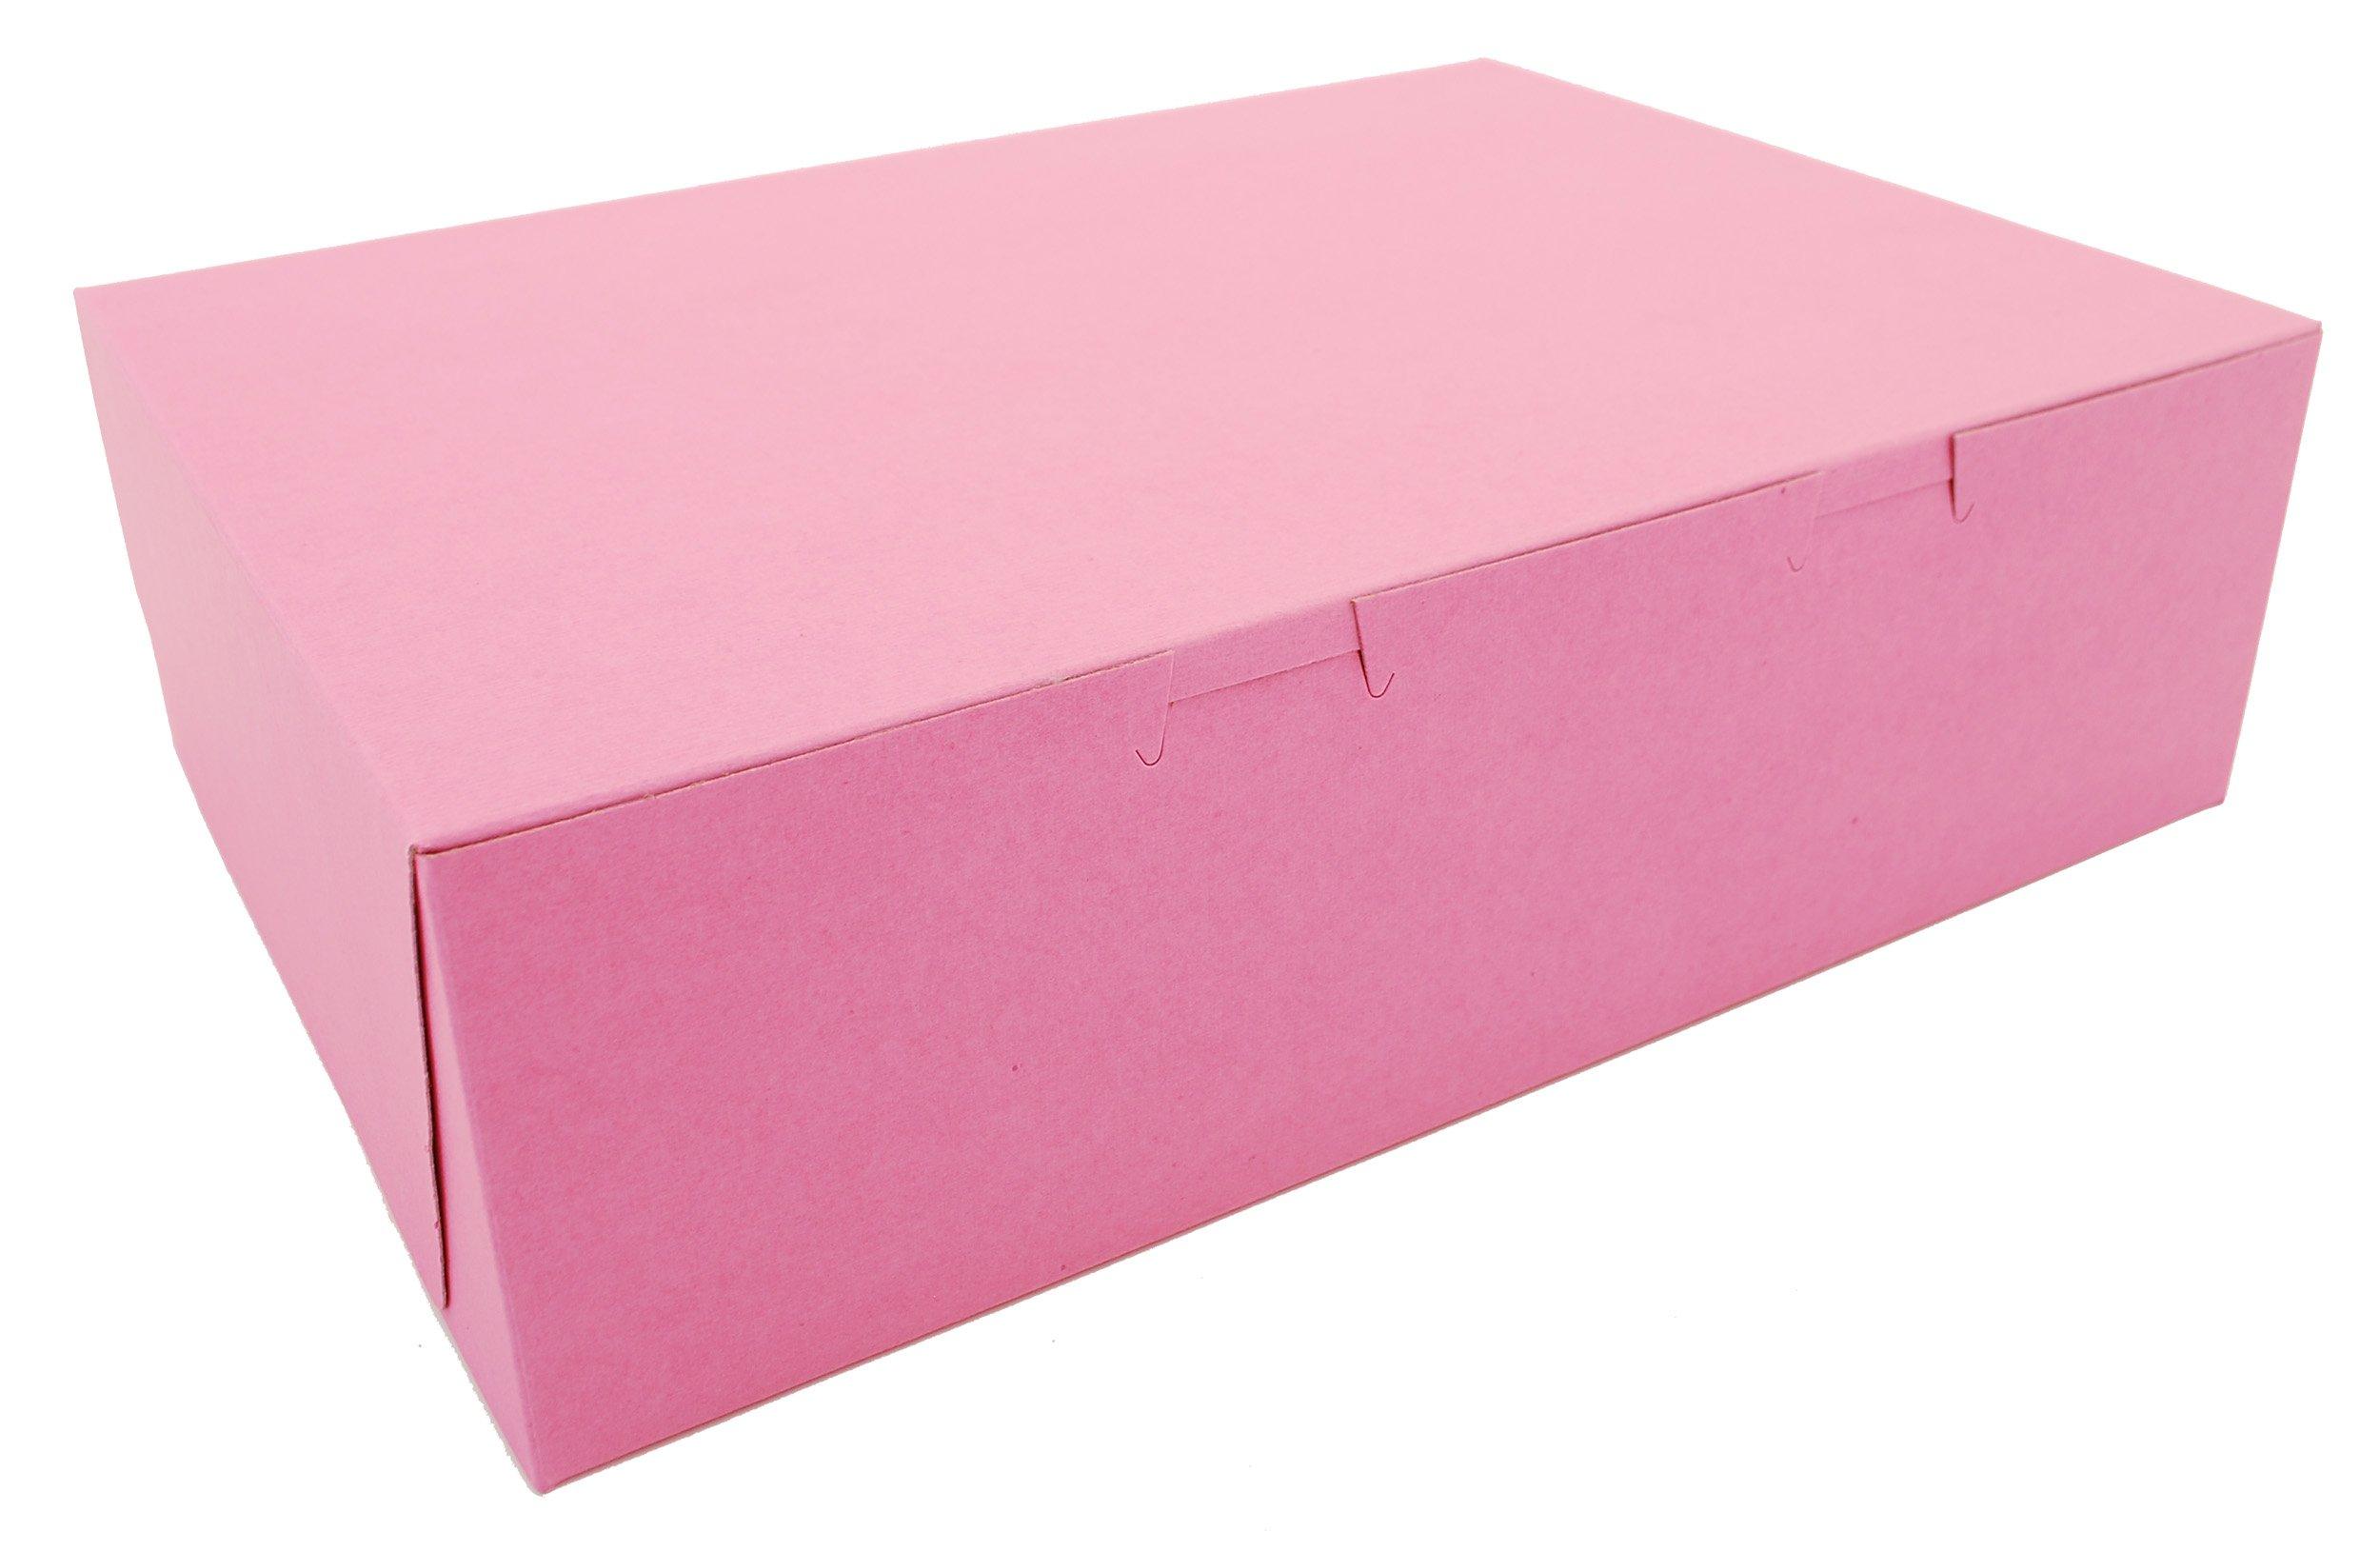 Southern Champion Tray 0890 Pink Paperboard Non-Window Lock-Corner Bakery Box, 14'' Length x 10'' Width x 4'' Height (Case of 100) by Southern Champion Tray